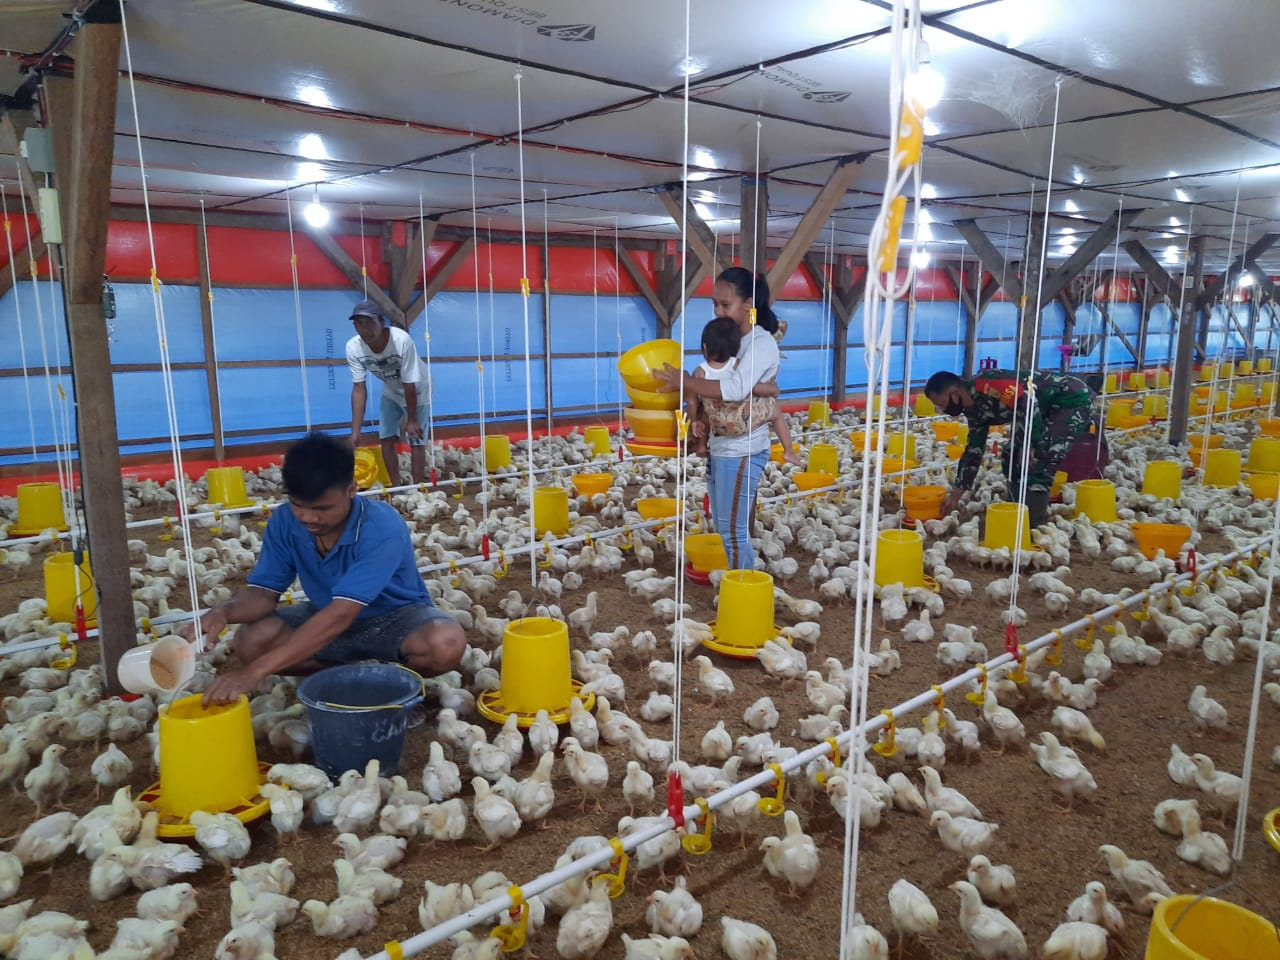 Babinsa Koramil 410-01Panjang Kodim 0410Kota Bandar Lampung Serda Aan Ansori beserta istrinya membangun suatu usaha peternakan ayam Broiler dengan sistem semi modern